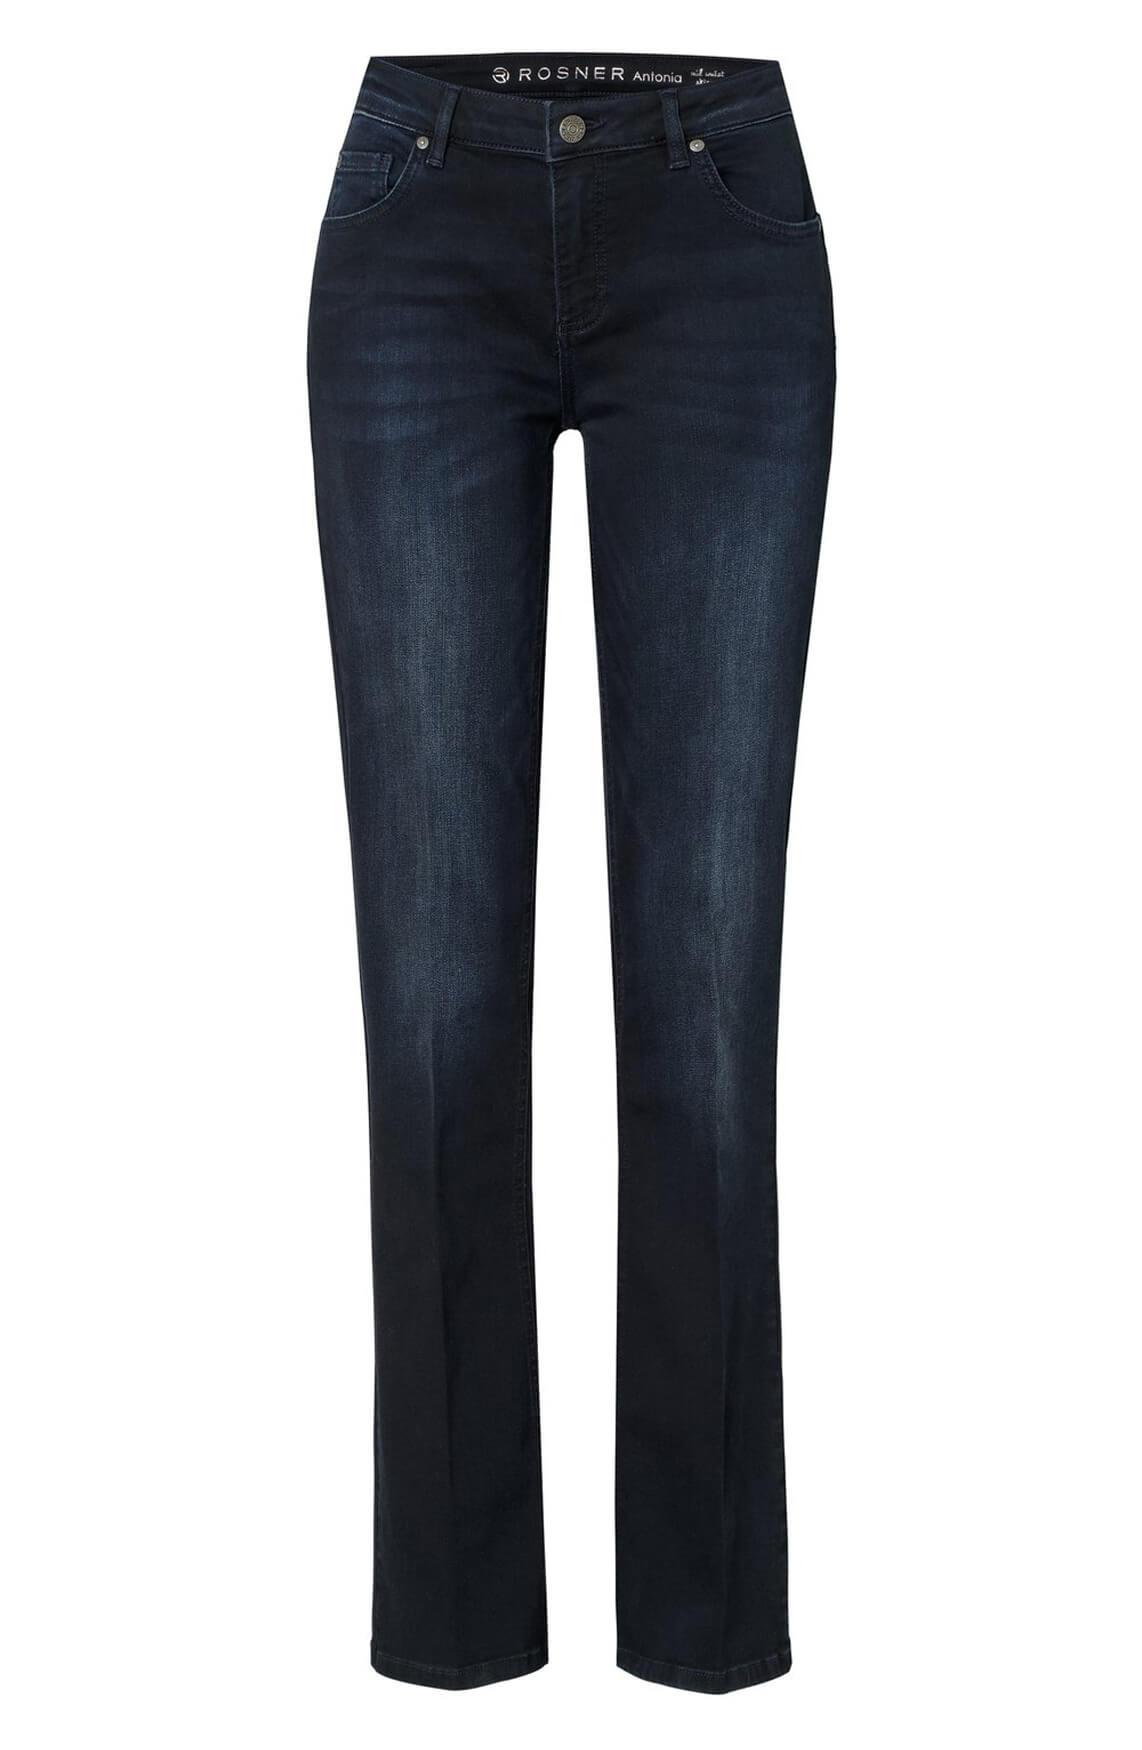 Rosner Dames L34 Antonia jeans Blauw